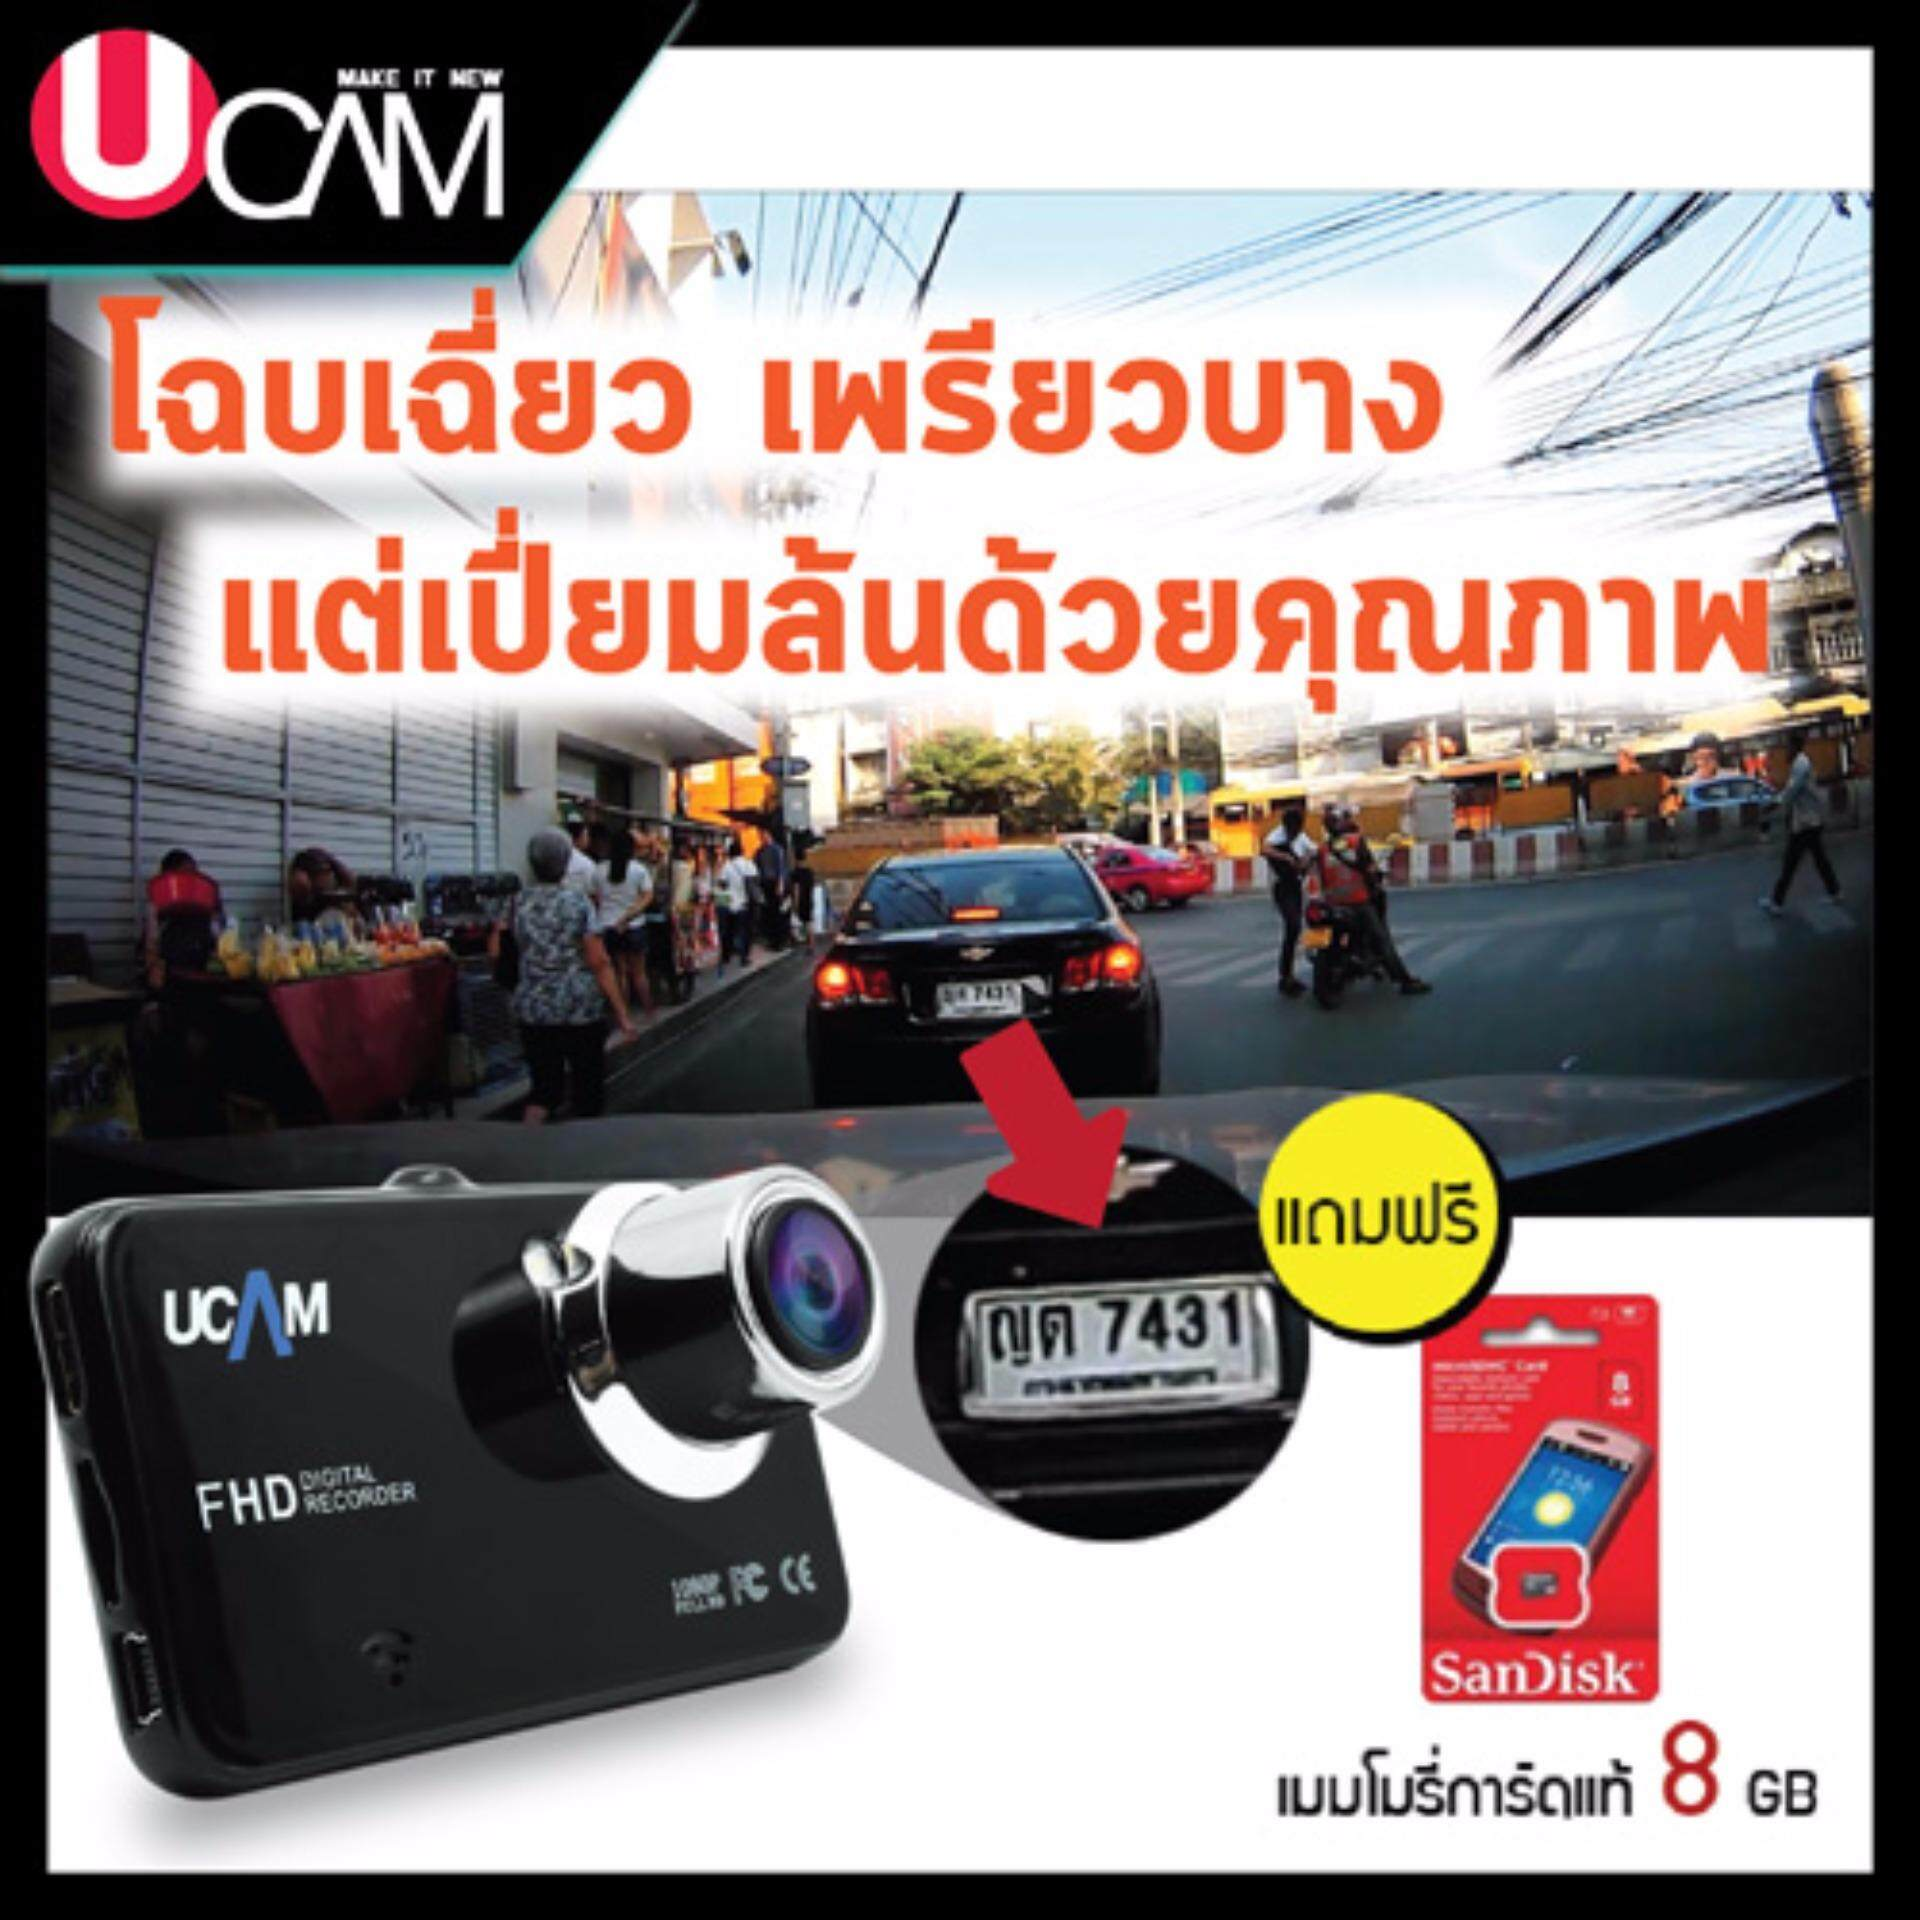 UCAM กล้องติดรถยนต์ windy black box FULL HD 1080P (พร้อมเมมโมรี่การ์ด 8 GB)